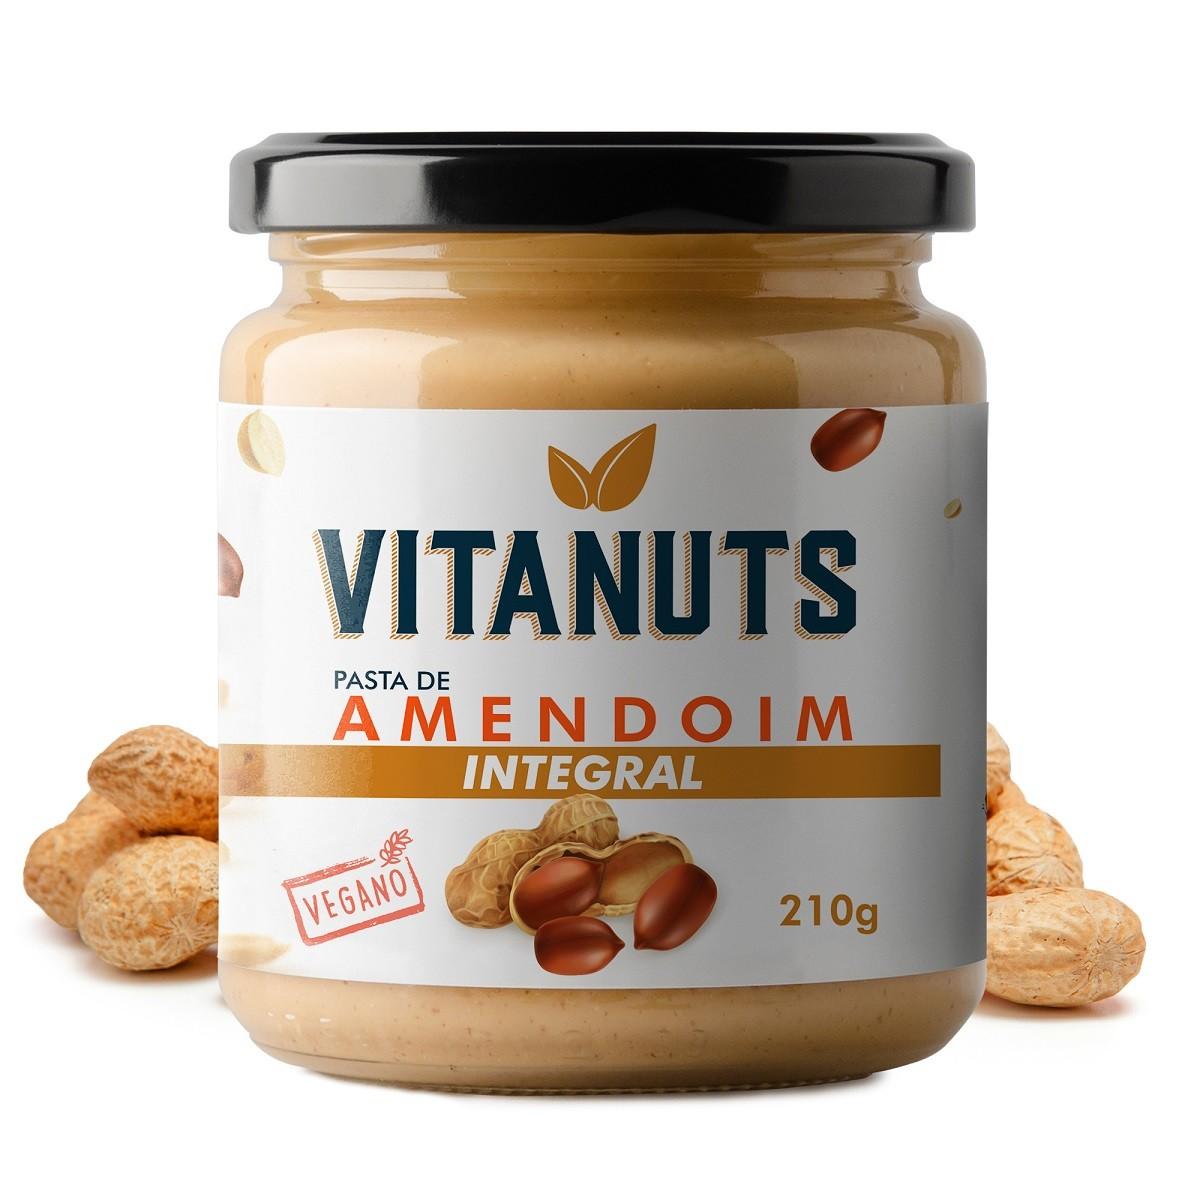 Pasta de Amendoim Integral (210g)